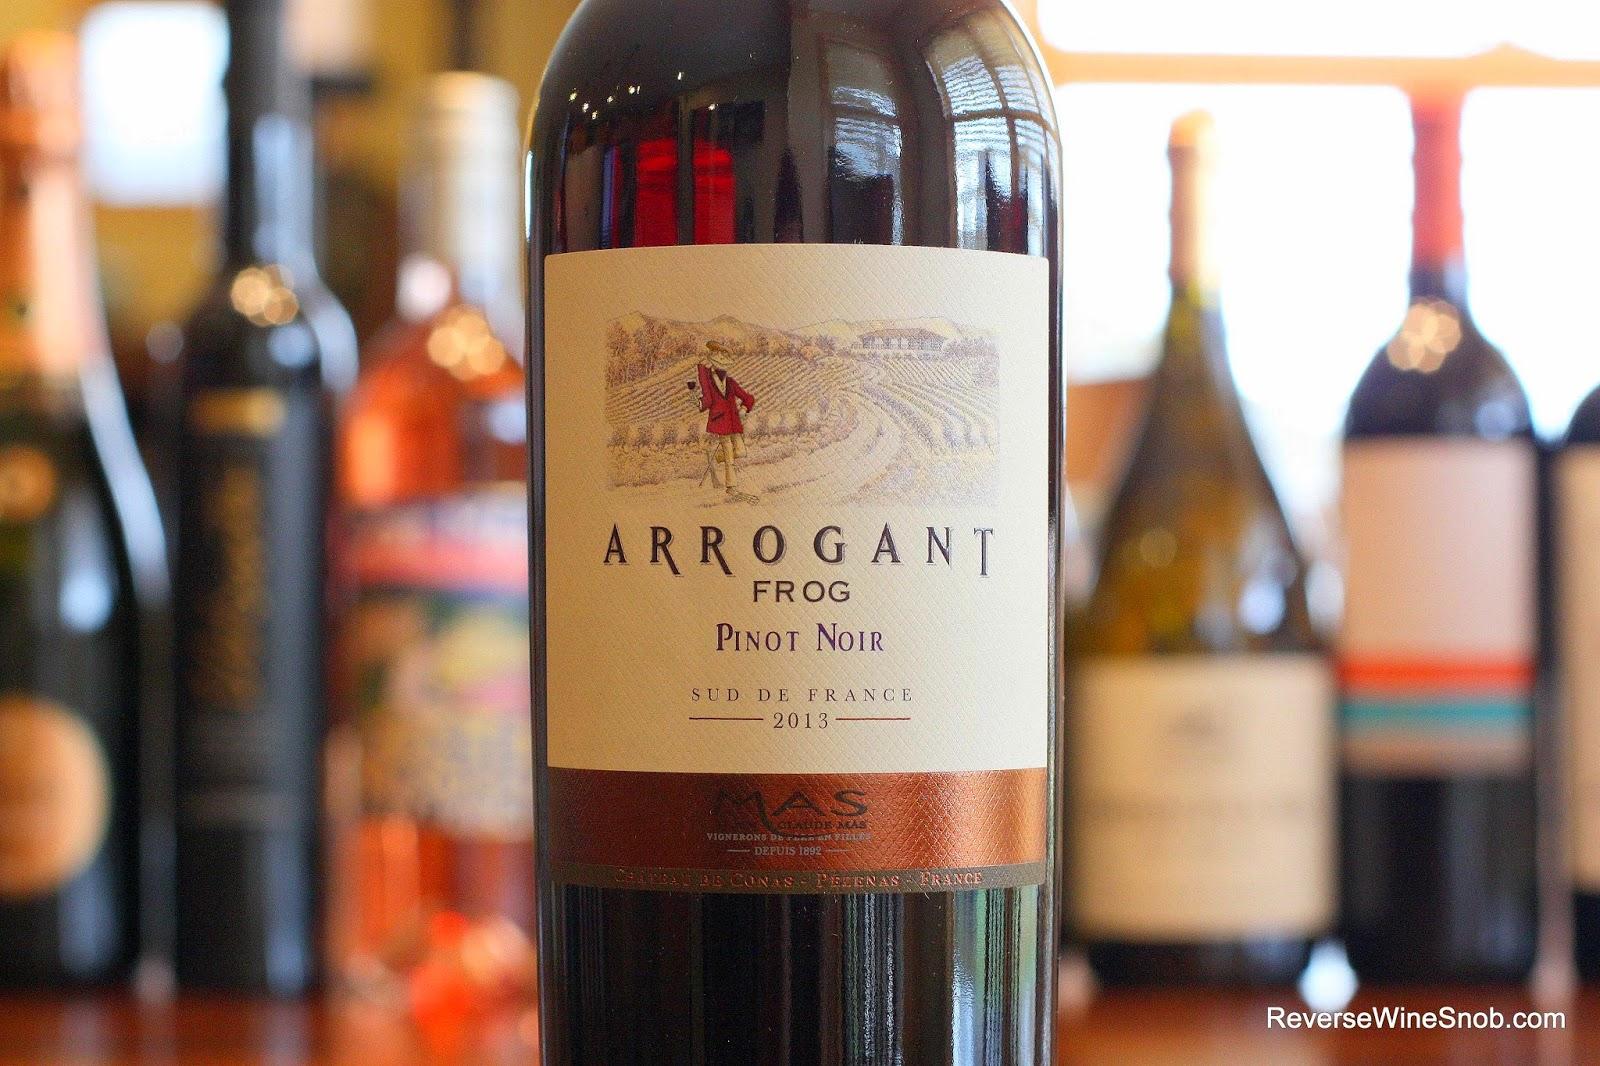 Arrogant Frog Pinot Noir 2013 – Lovely Languedoc on ReverseWineSnob